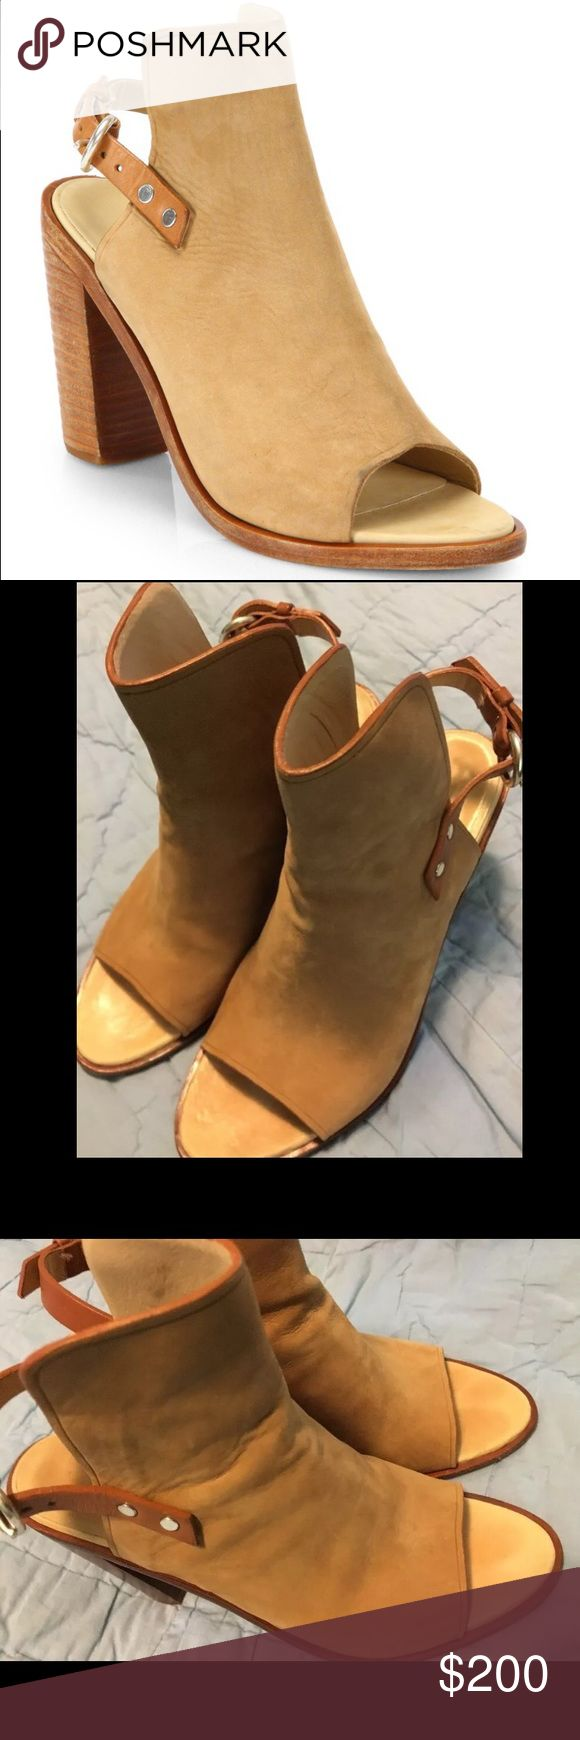 Rag and Bone Wyatt Suede Slingback Sandals Rag and Bone Wyatt Suede slingback sandals in Camel. Size 39.5 rag & bone Shoes Sandals